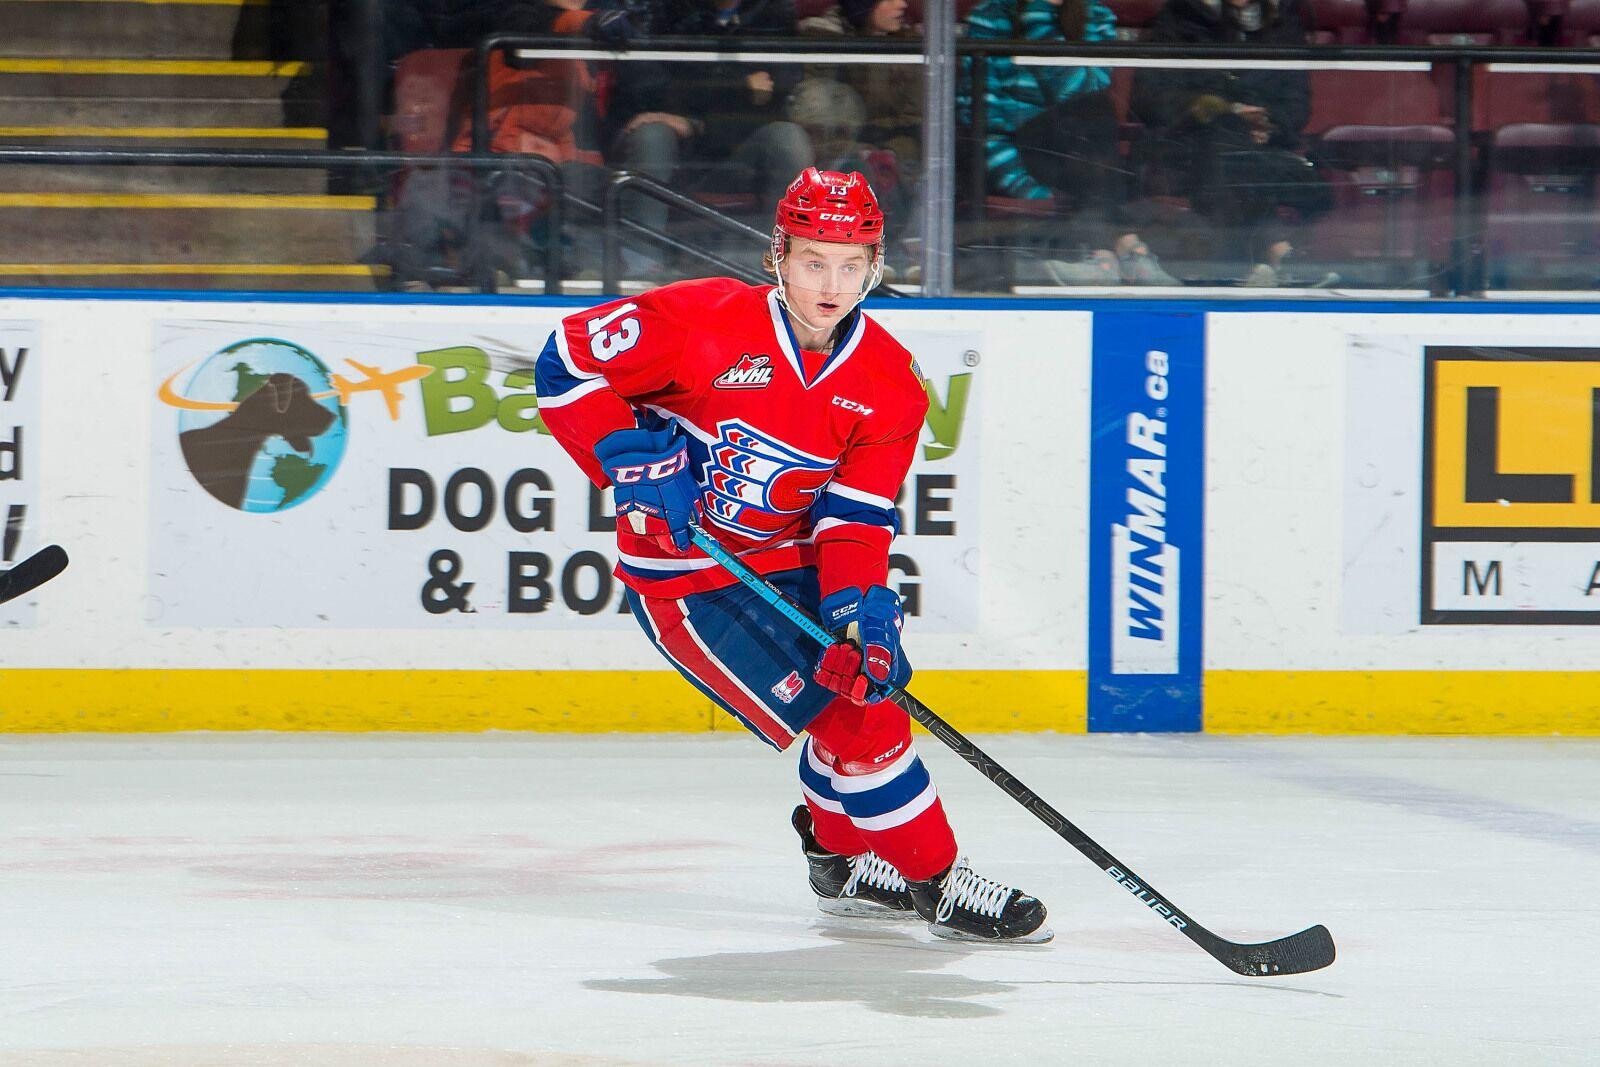 Toronto Maple Leafs: Offseason Has Begun for the Marlies